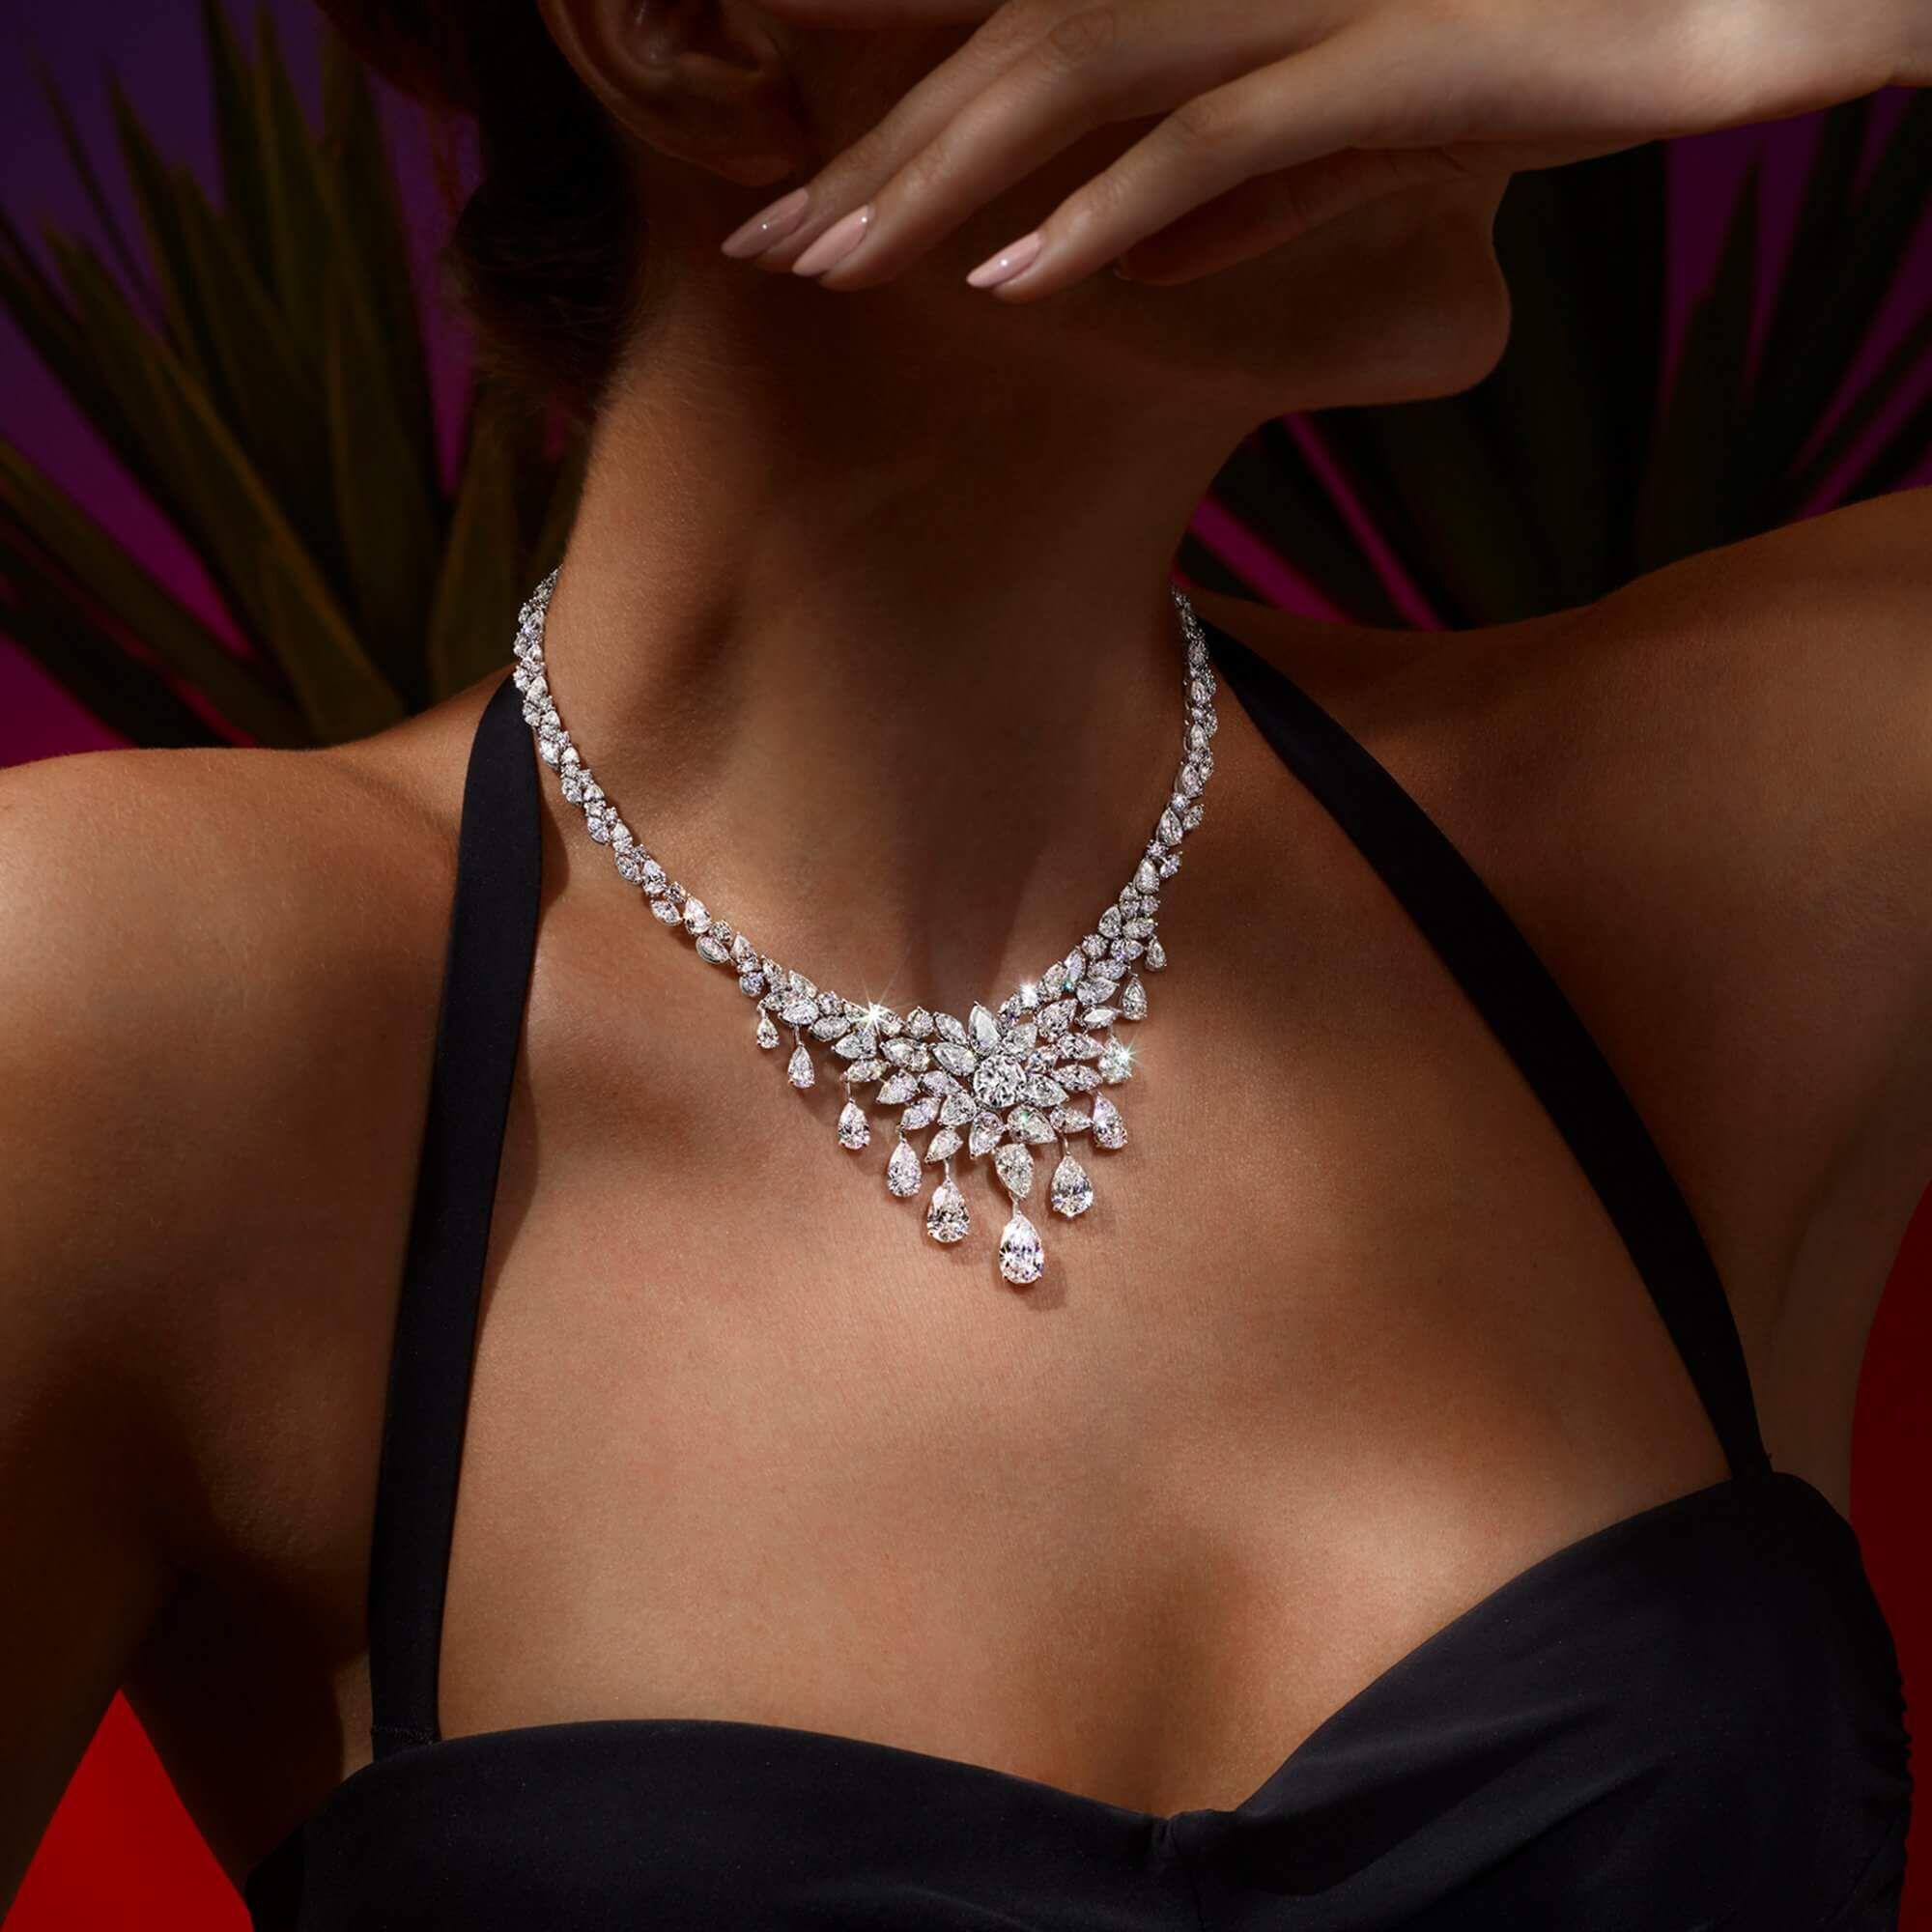 A model in black swimsuit wearing a Graff diamond necklace